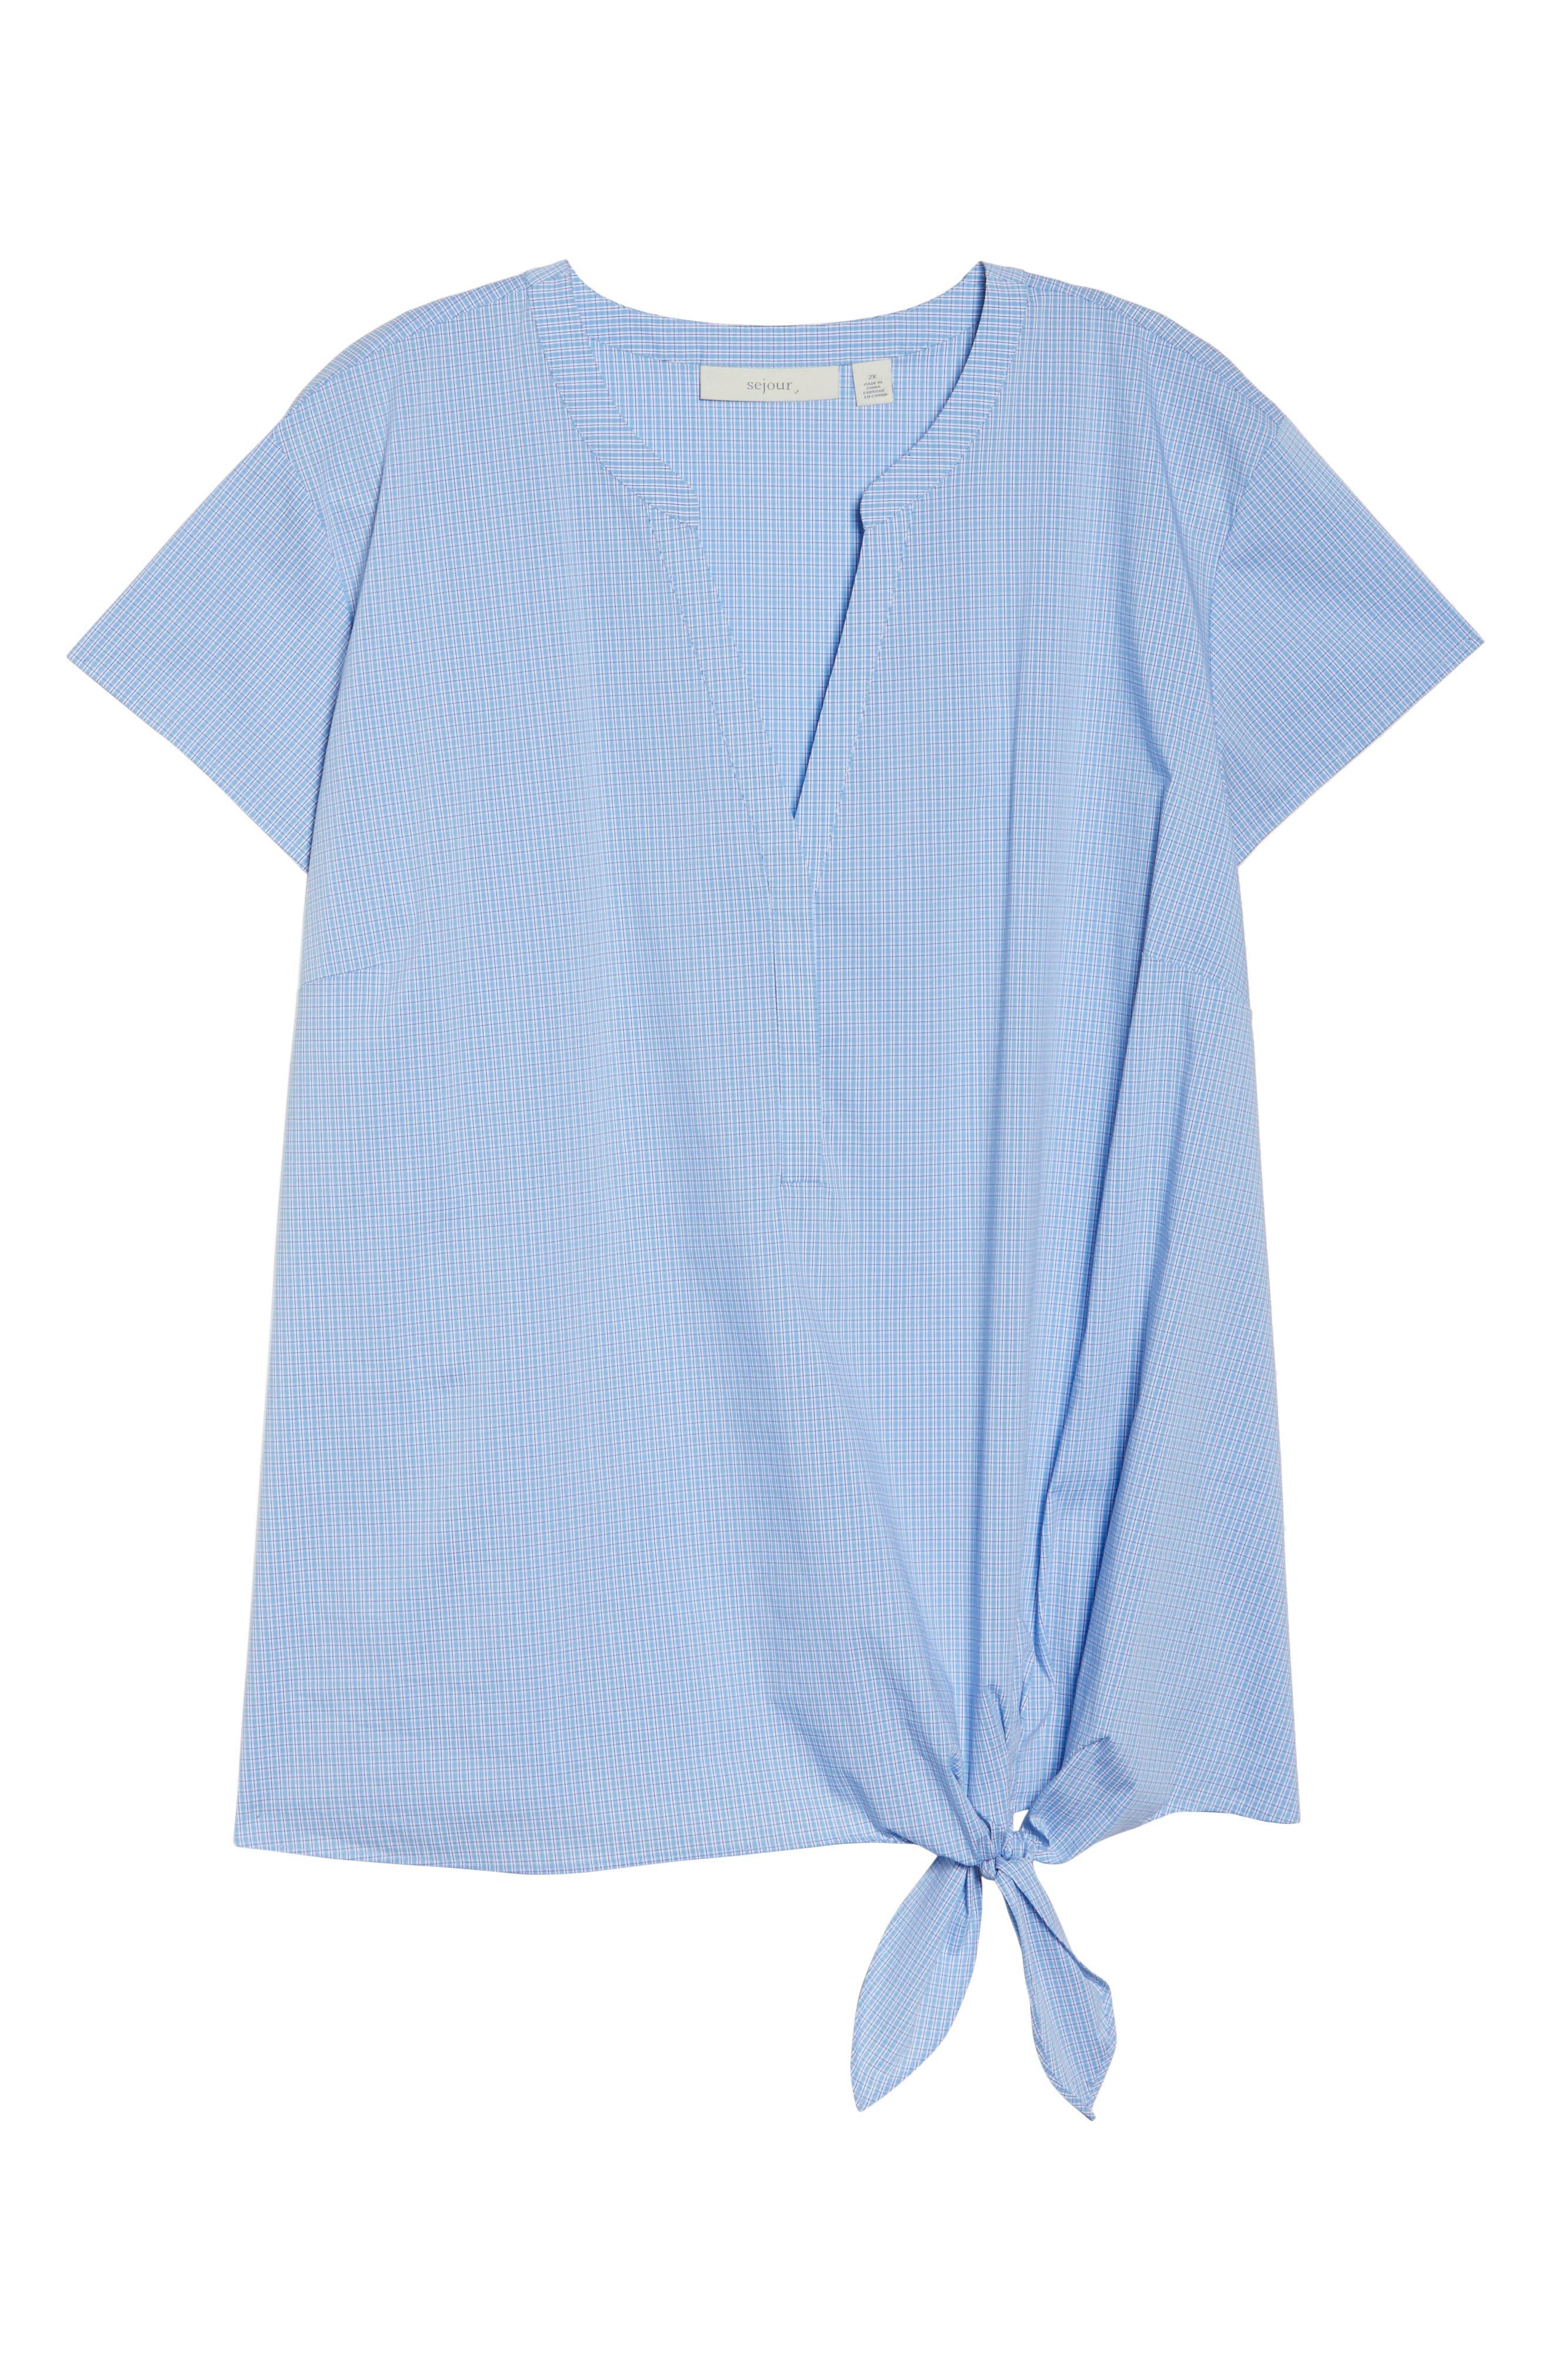 Side Tie Stretch Poplin Top,                             Alternate thumbnail 6, color,                             Blue Lily Plaid